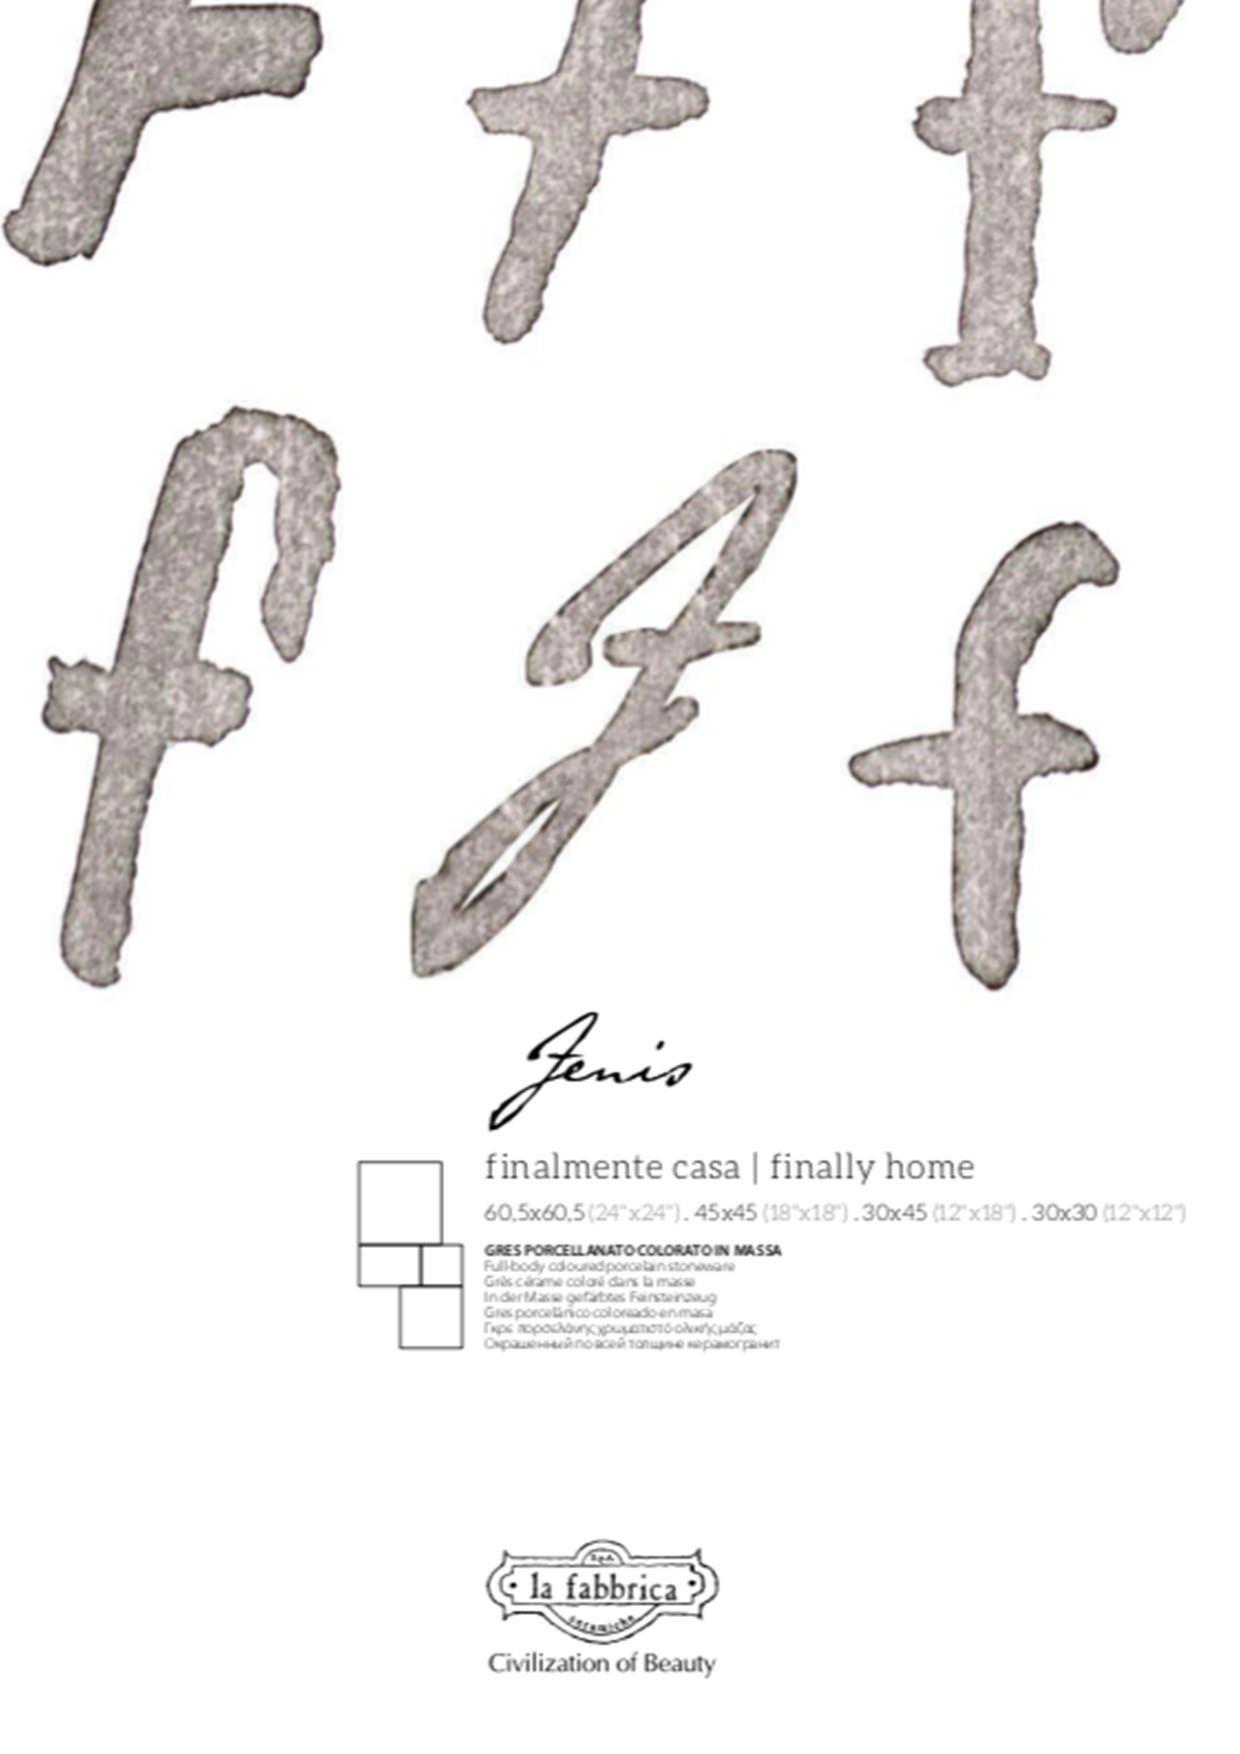 La Fabbrica Catalogo Fenis